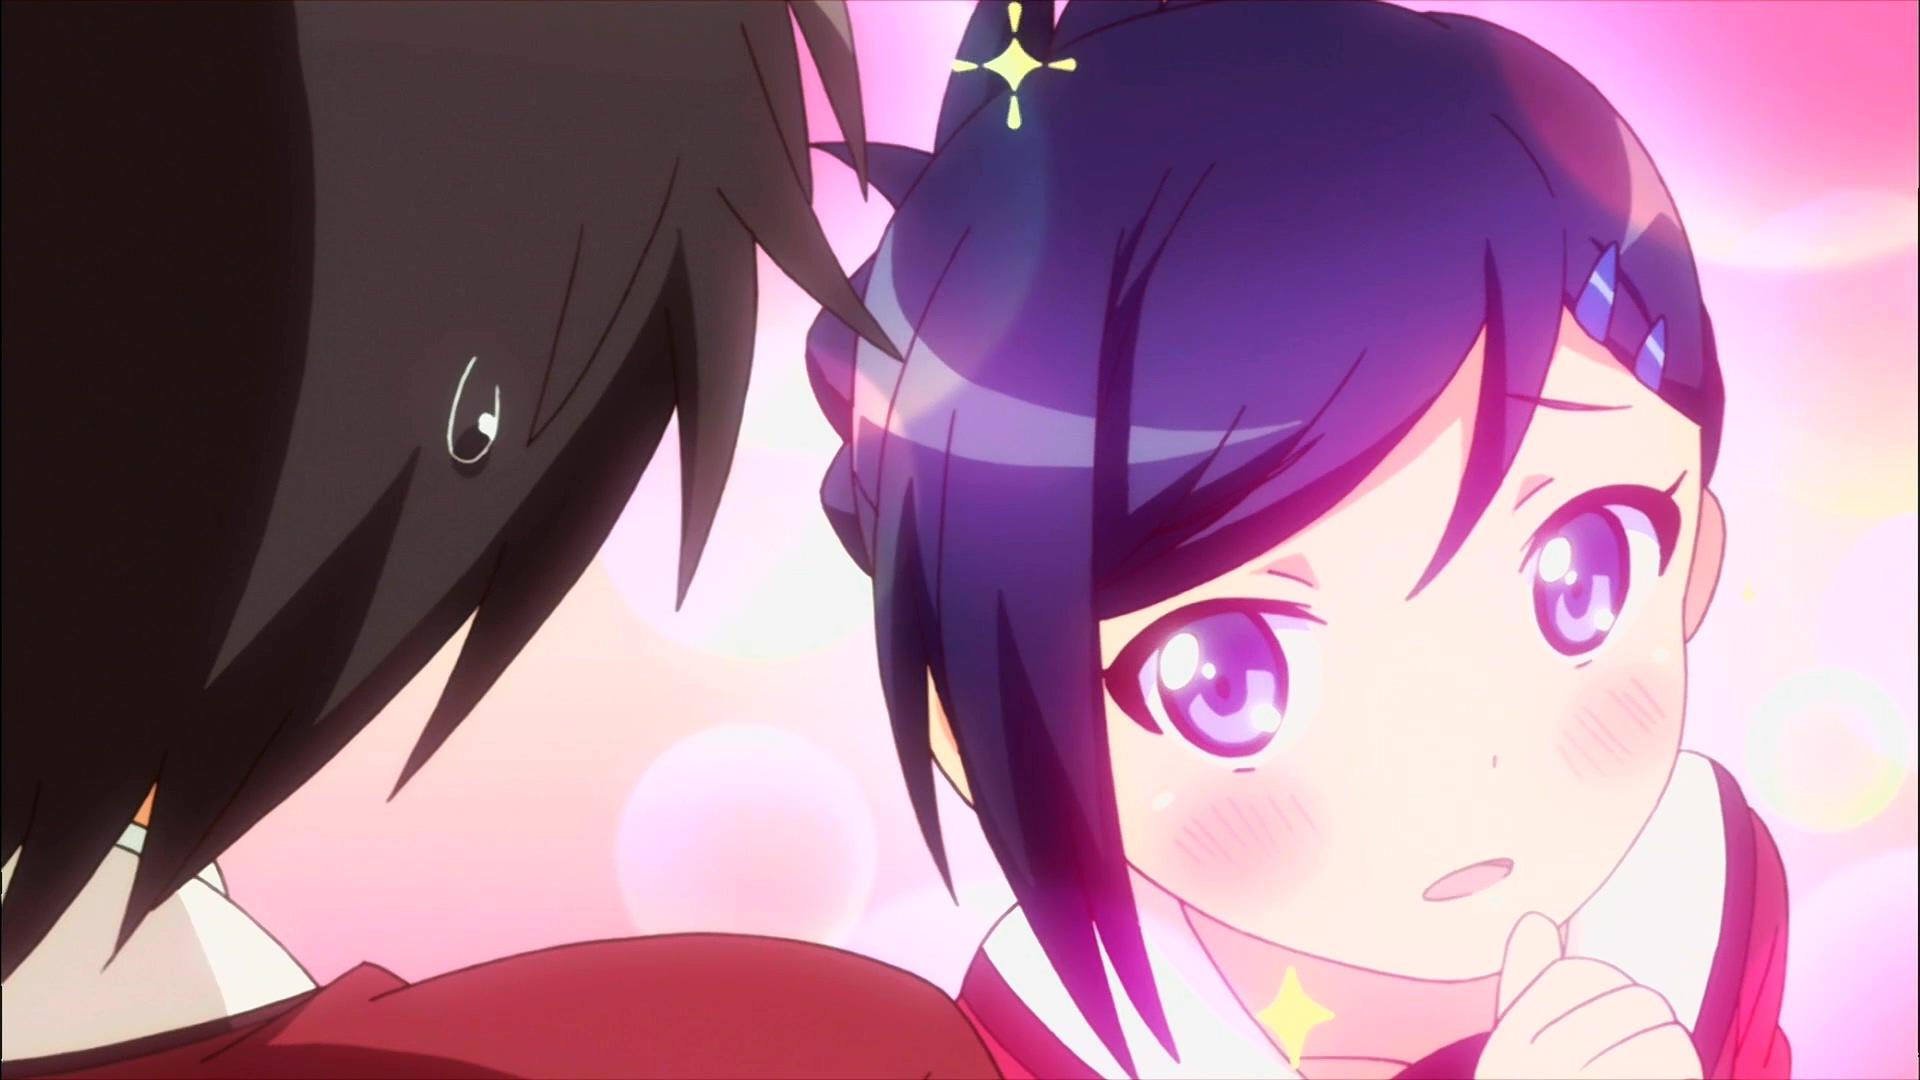 [HorribleSubs] Inou Battle wa Nichijou-kei no Naka de - 02 [1080p].mkv_20141019_005420.125.jpg